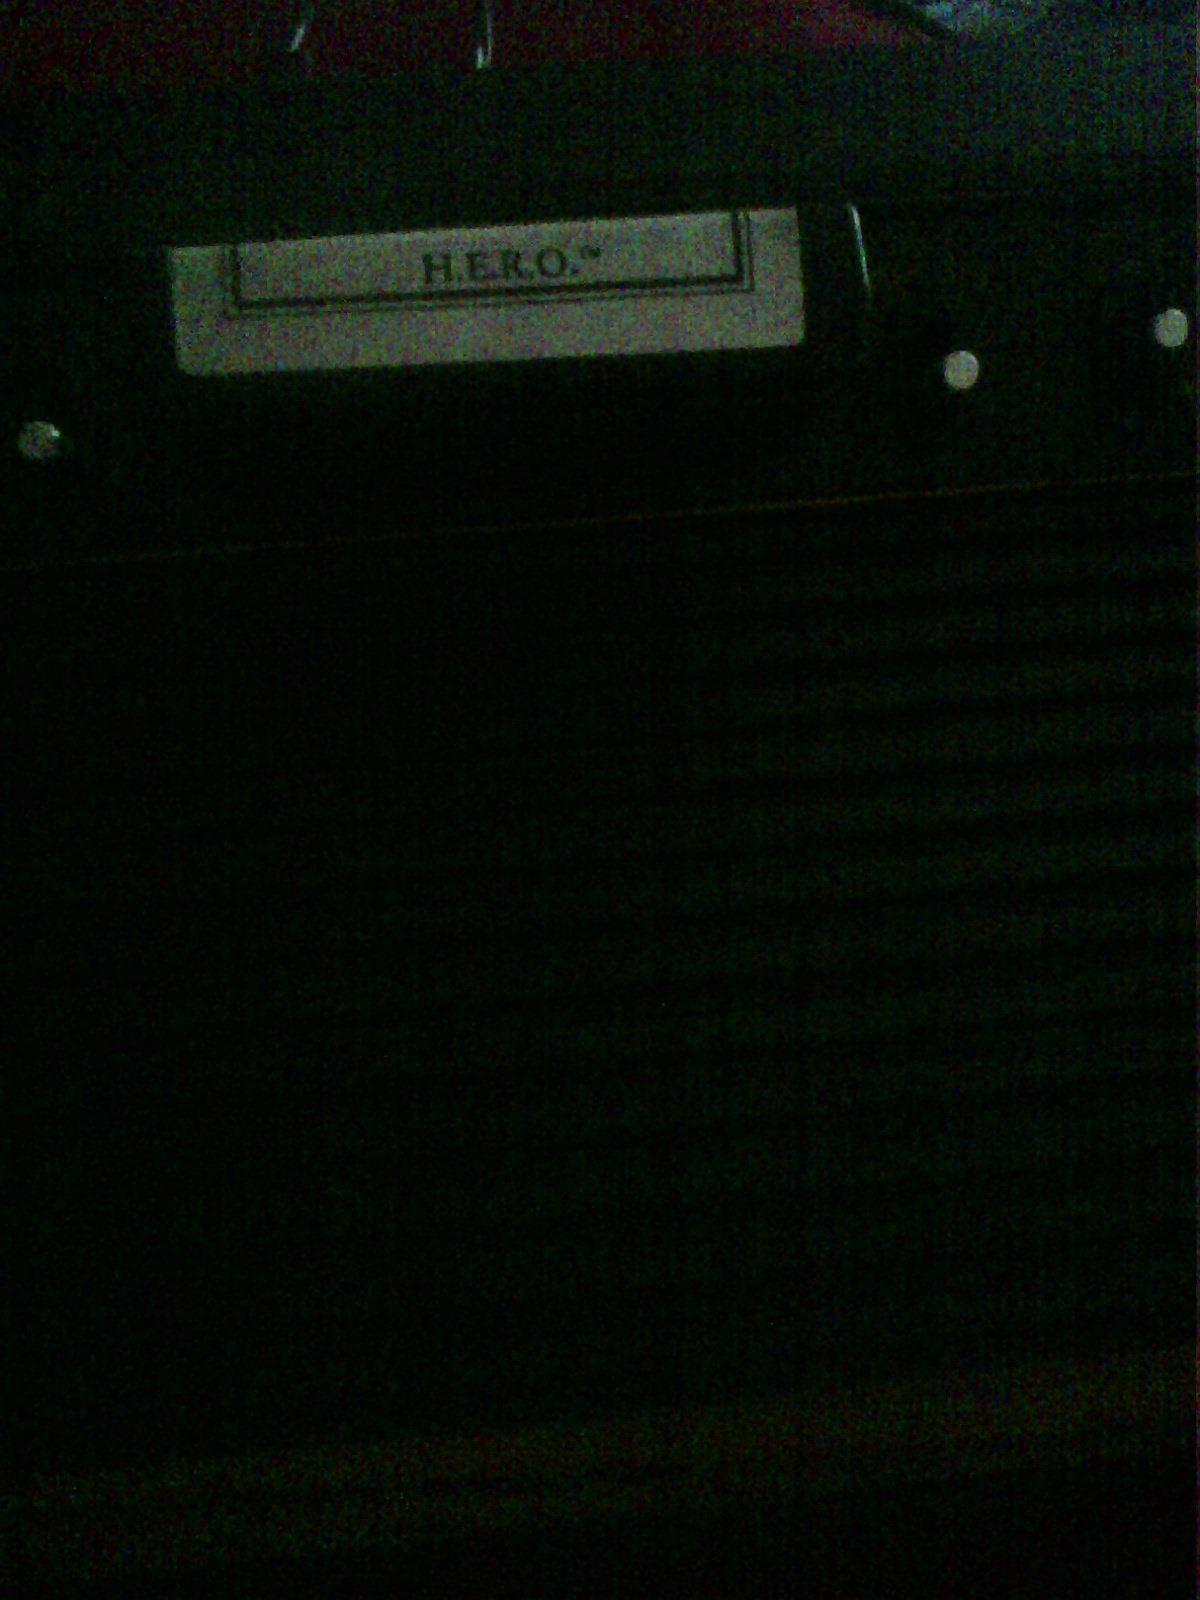 H.E.R.O. 75,210 points